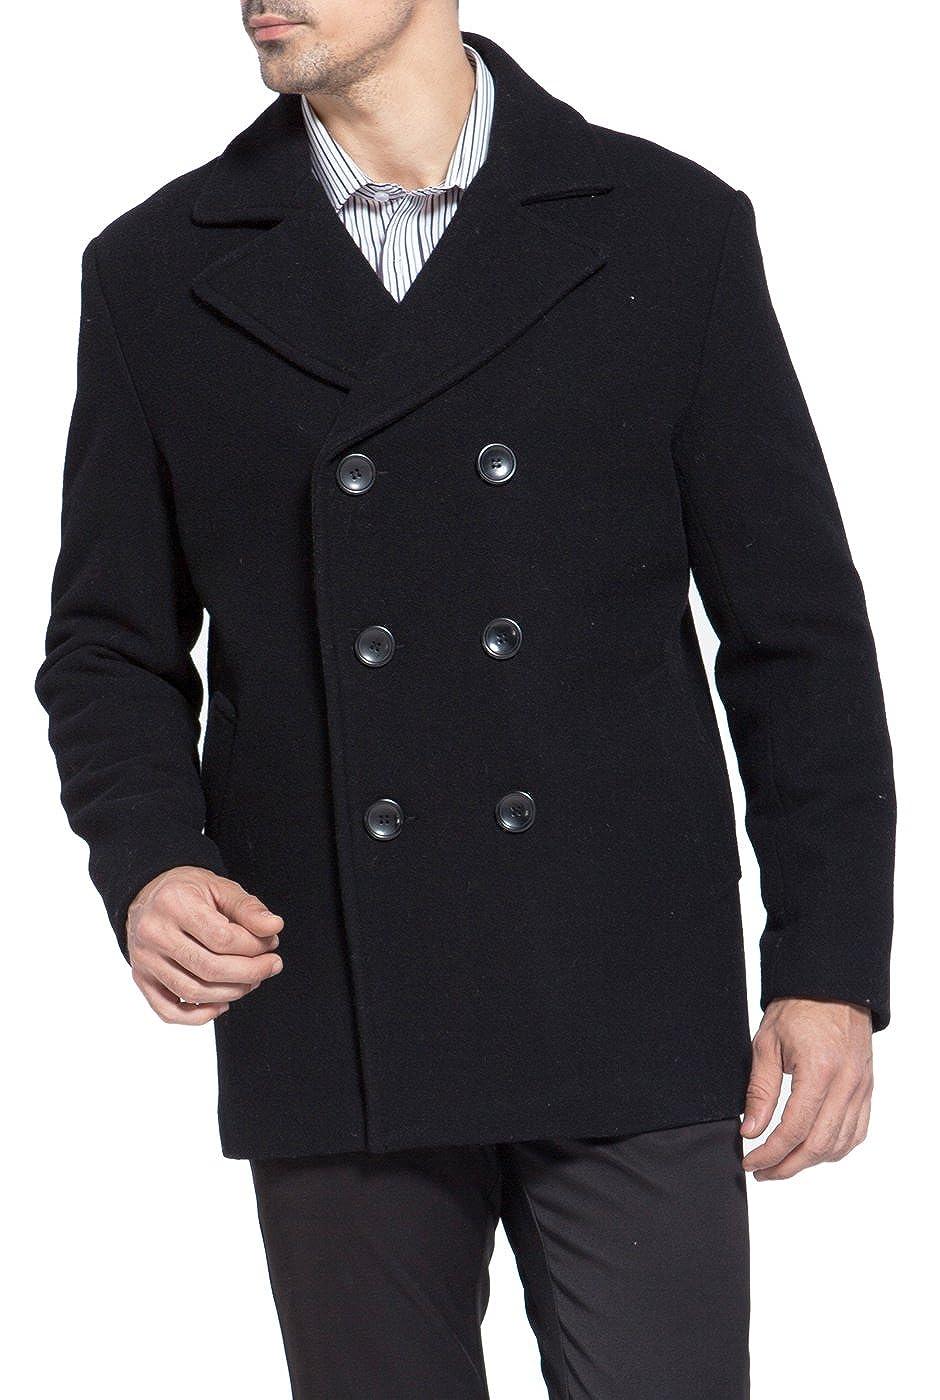 Big and Tall 4XLT BGSD Mens Mark Classic Wool Blend Pea Coat Black